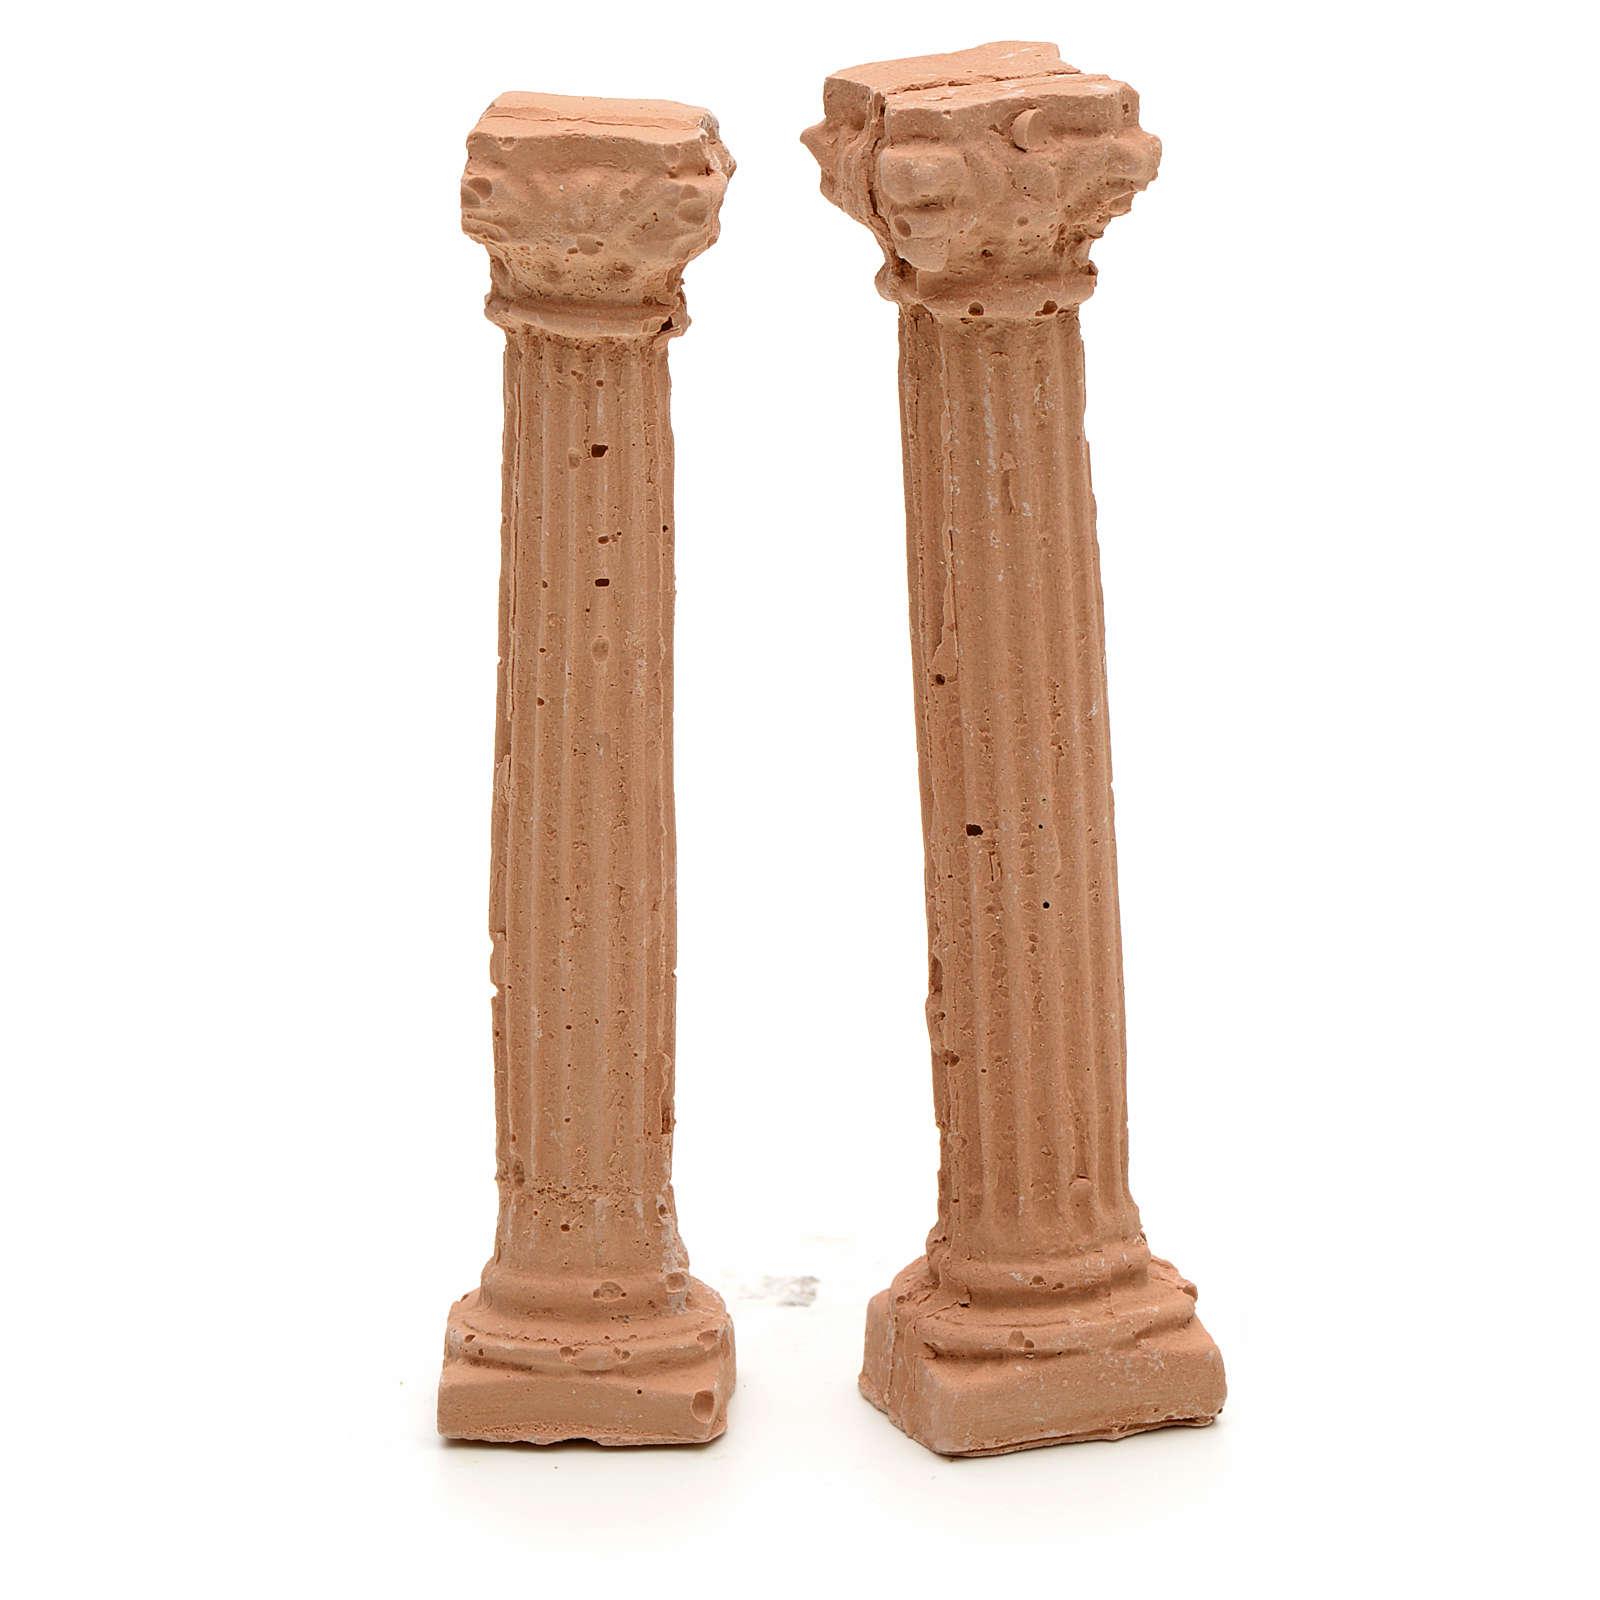 Nativity accessory, resin ionic columns, 7cm 4